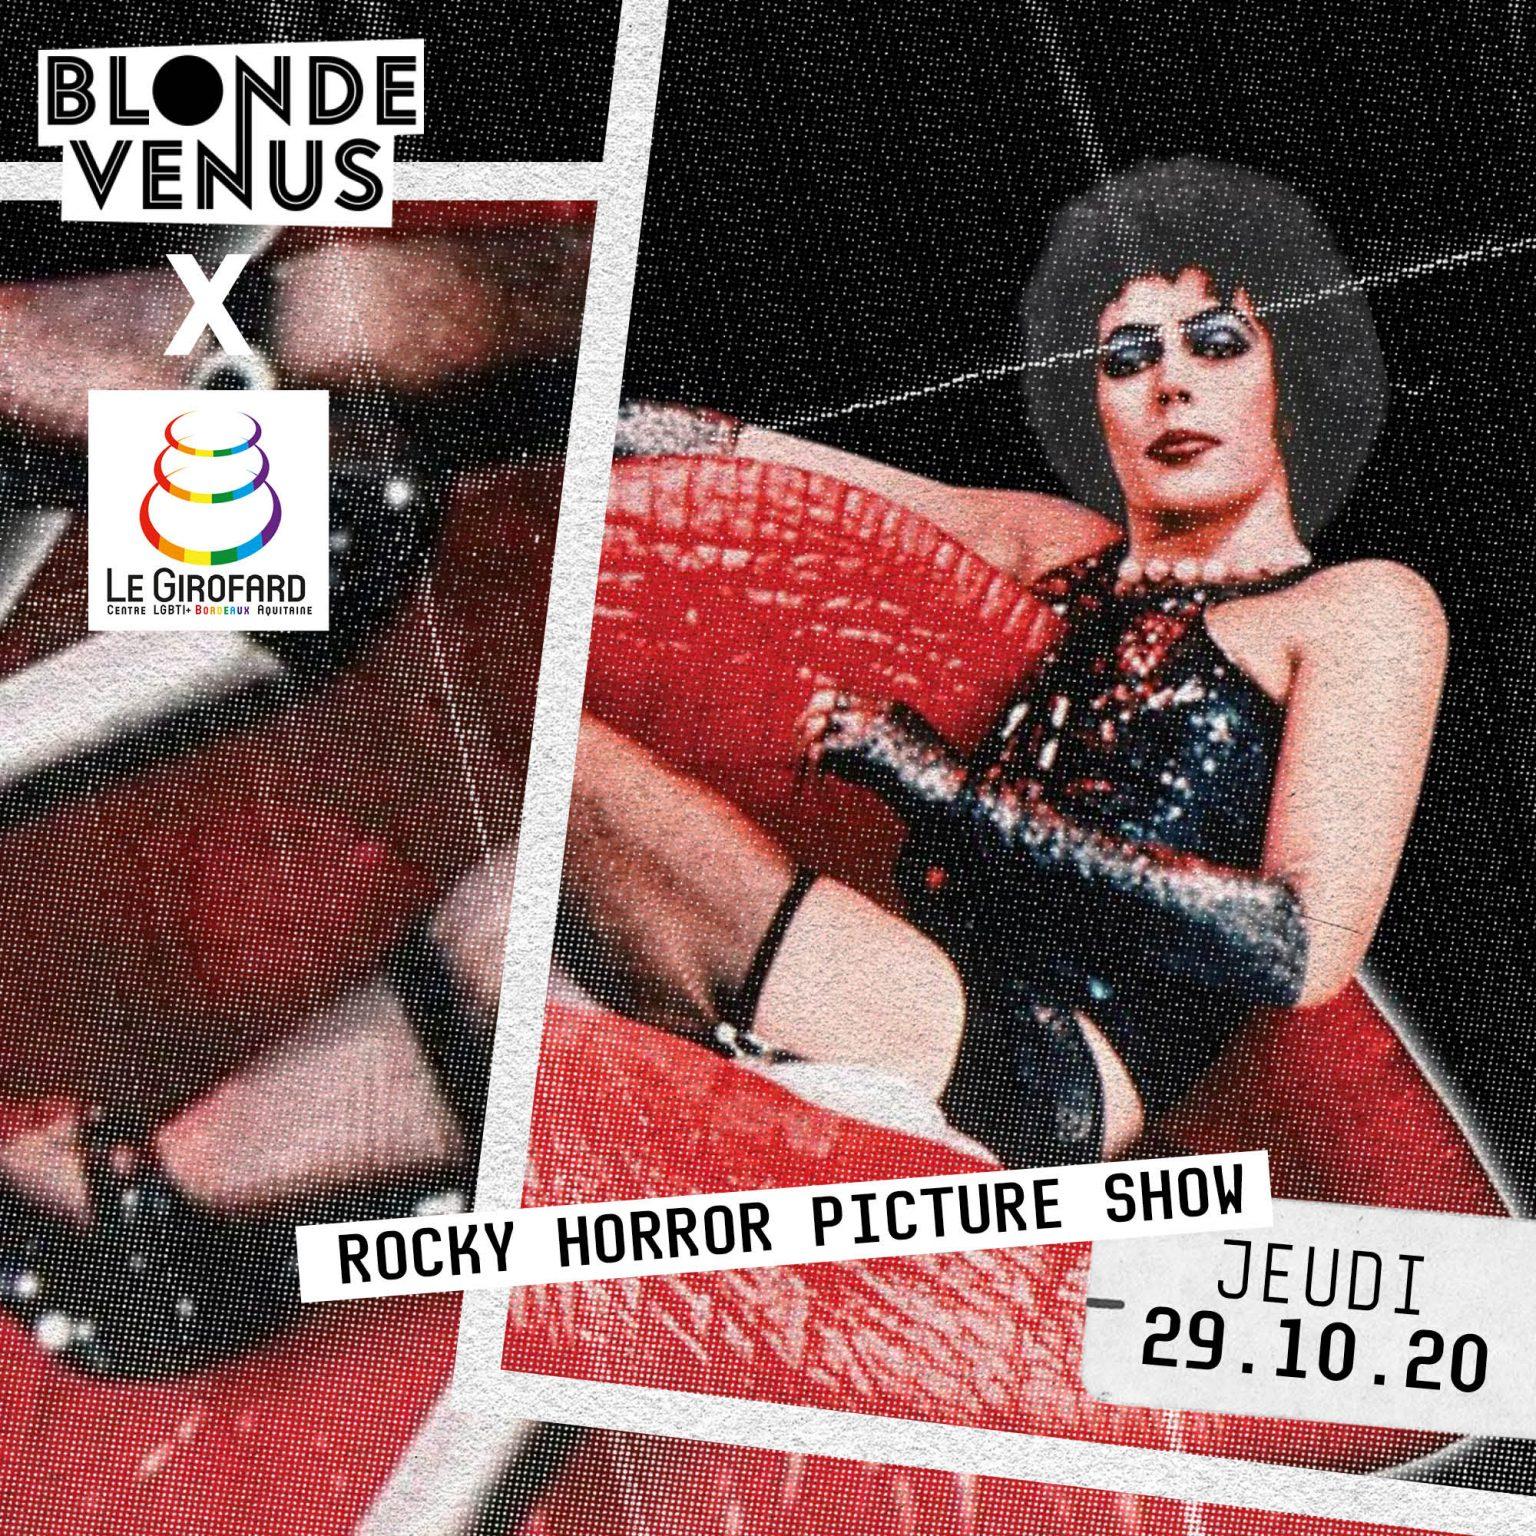 [Activités] Rocky Horror Picture Show X Venus Blonde X Girofard